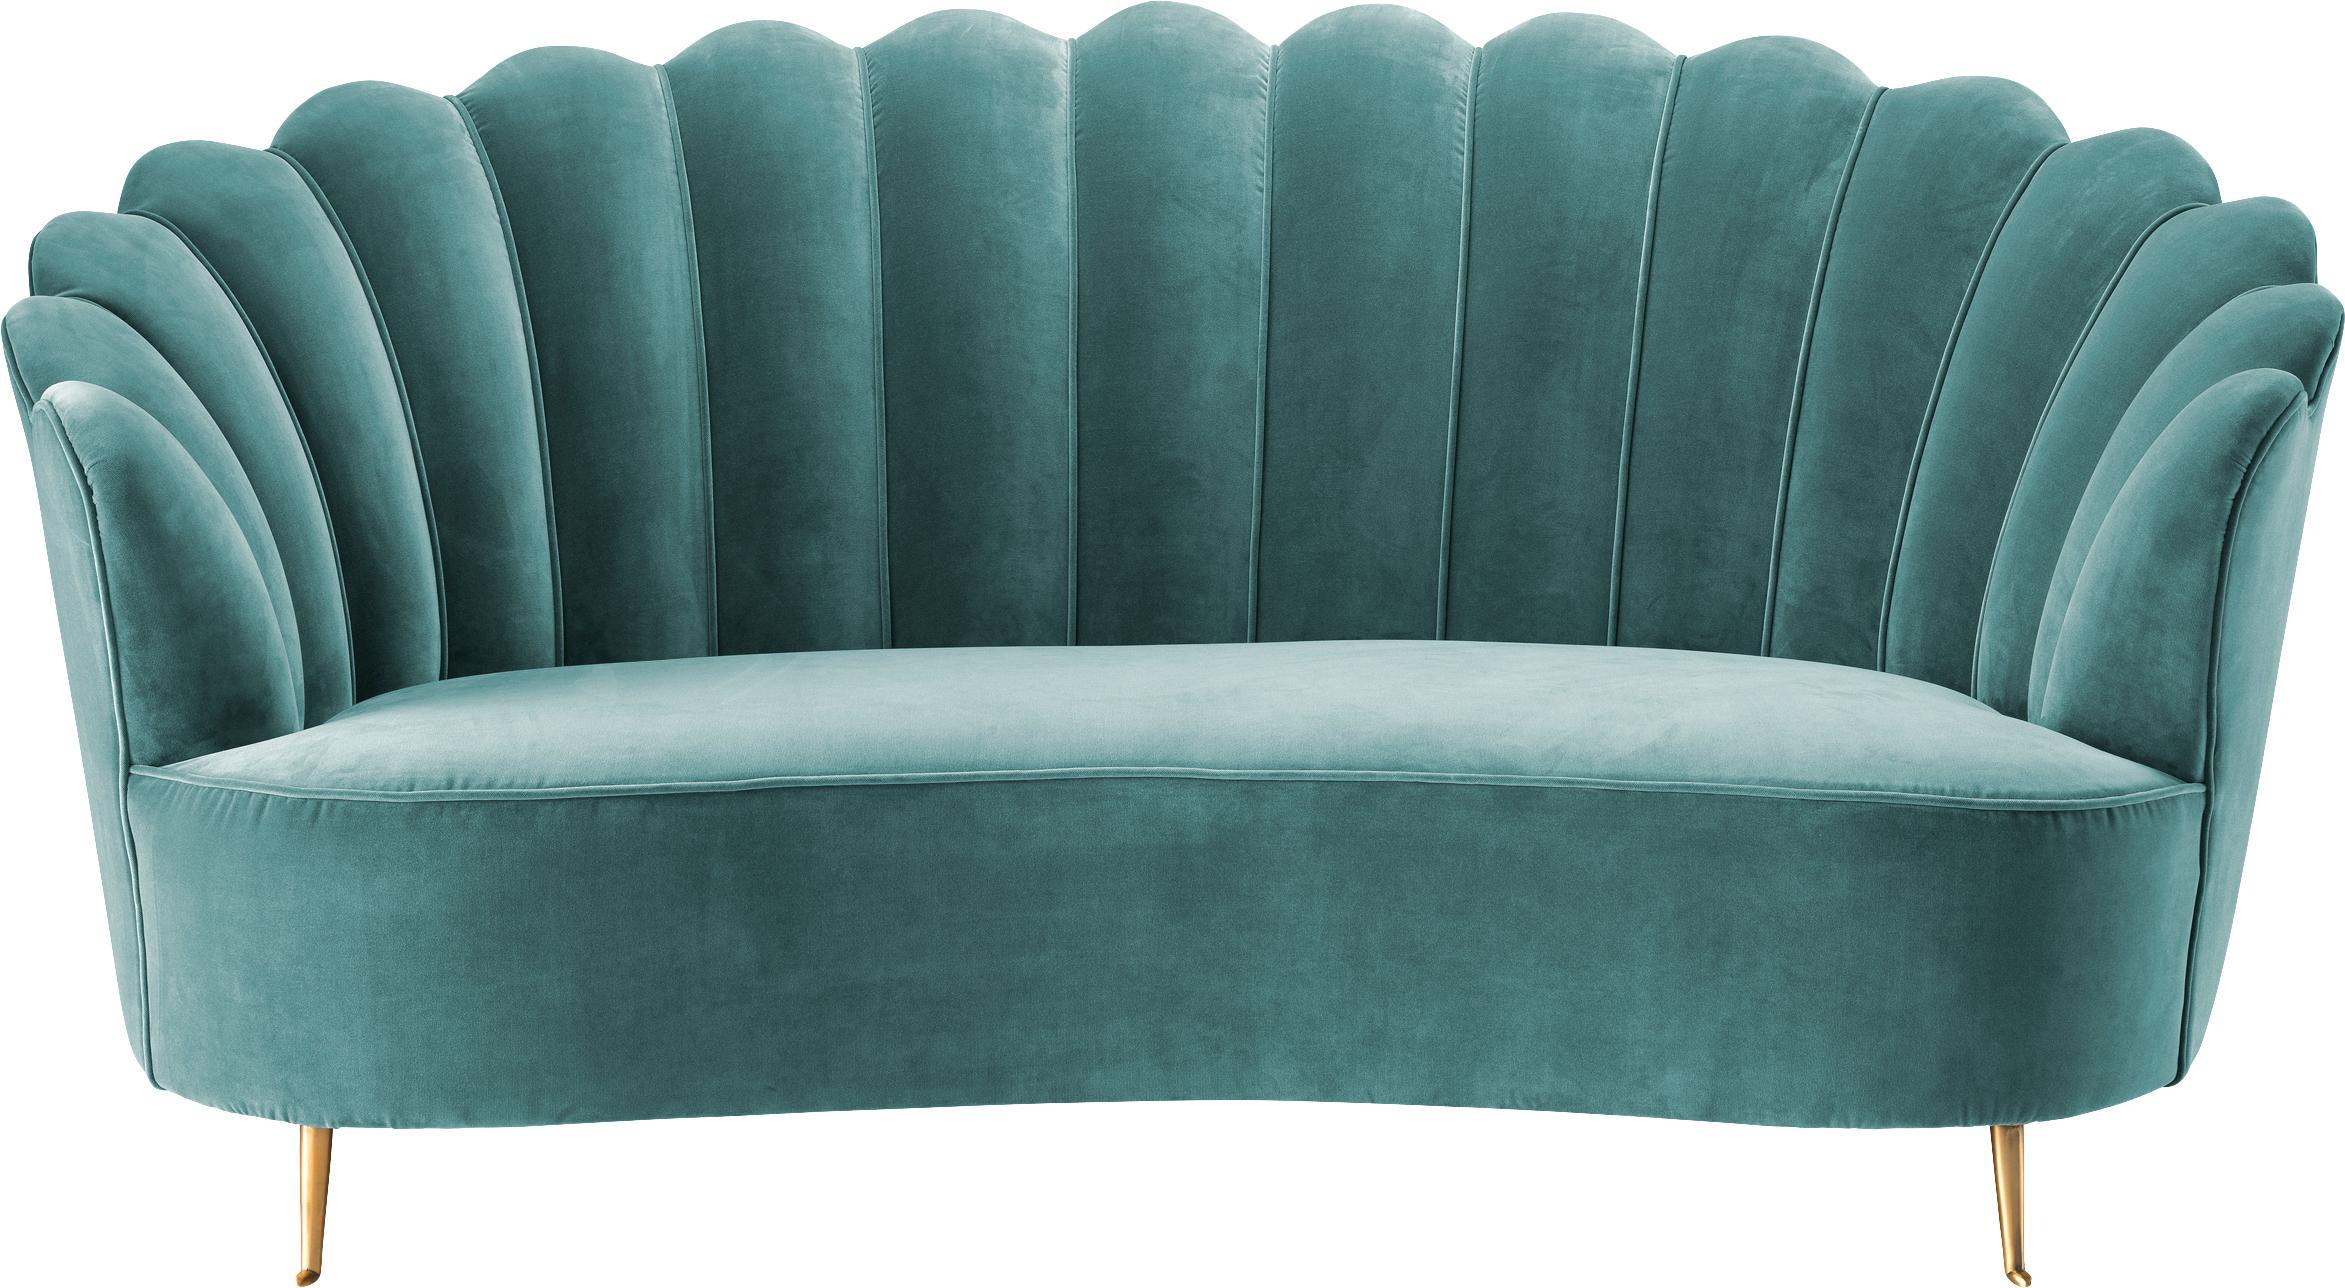 Samt-Sofa Messina (2-Sitzer), Bezug: 95% Polyester, 5% Baumwol, Samt Türkis, B 180 x T 95 cm